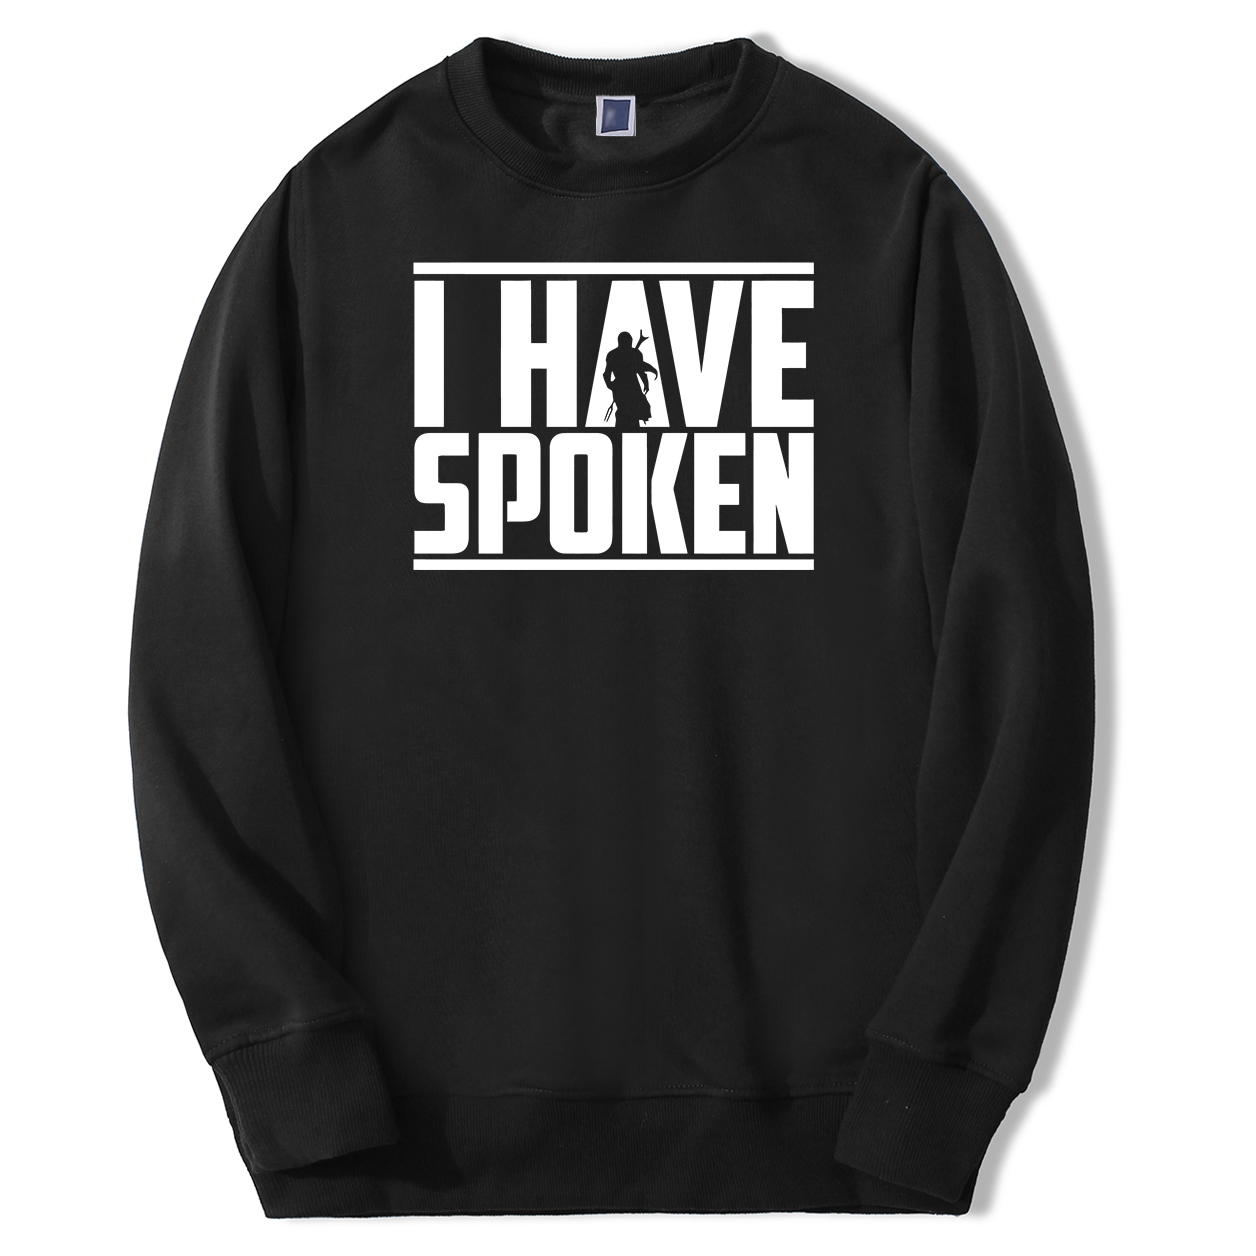 The Mandalorian Mens Star Wars Sweatshirts Hoodie Fleece Streetwear Crewneck Spring Autumn Sweatshirt I Have Spoken Sportswear